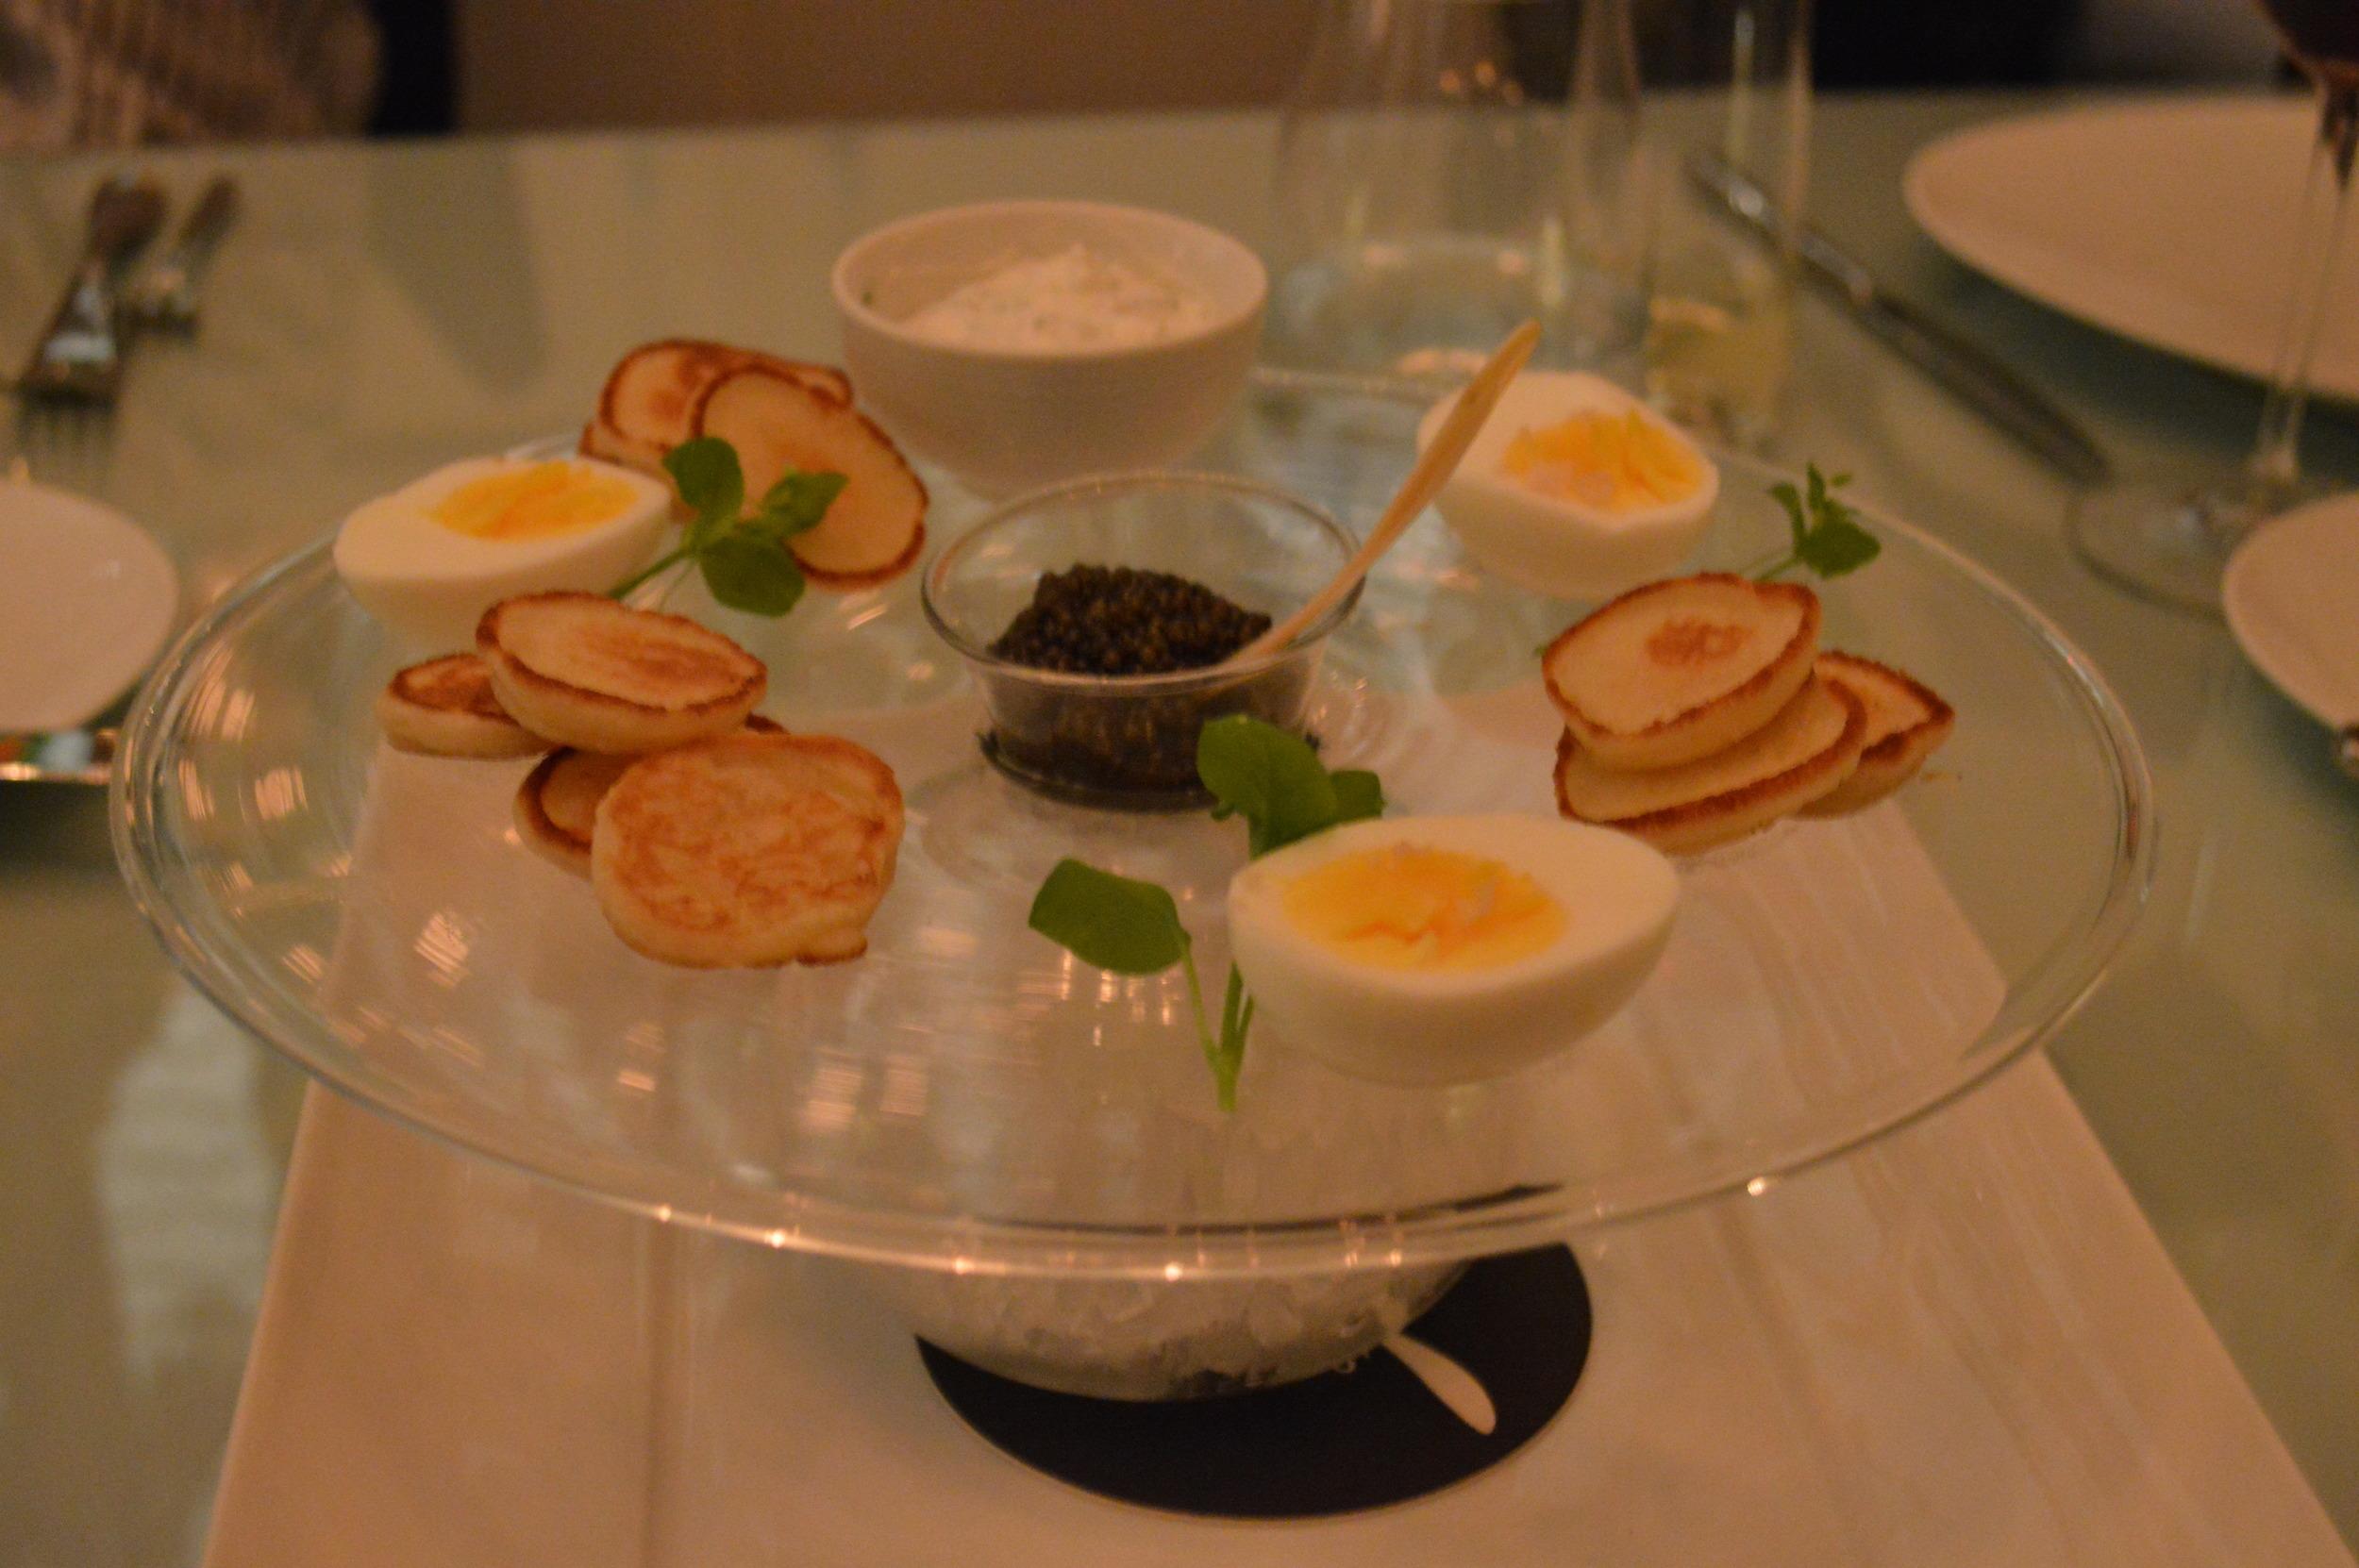 Spoon - Hard Boiled Eggs + Caviar